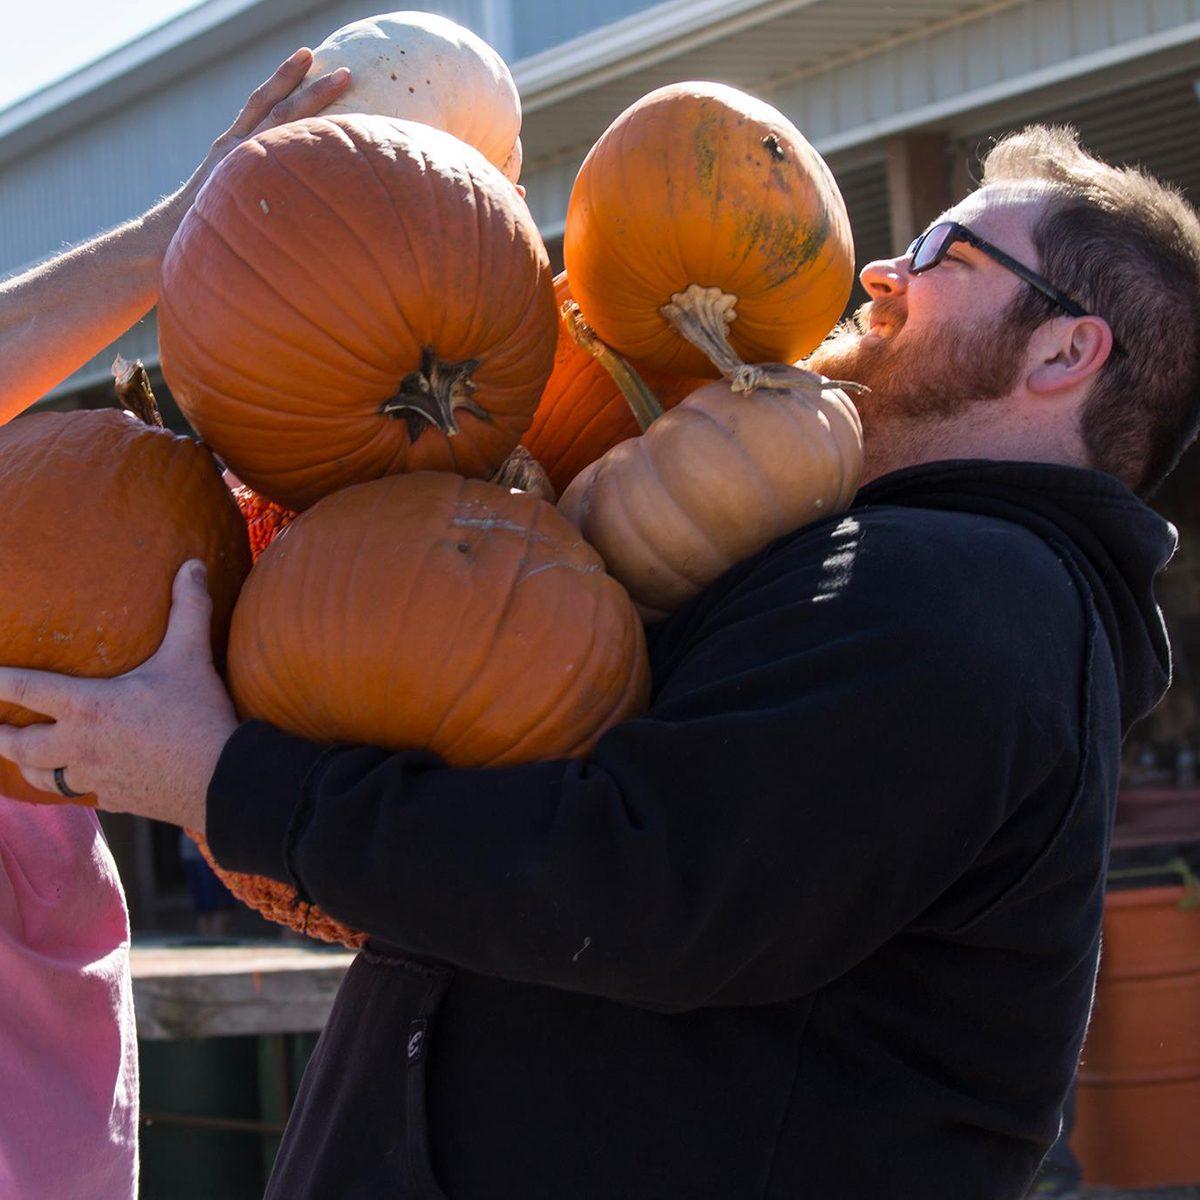 Man carrying pumpkins